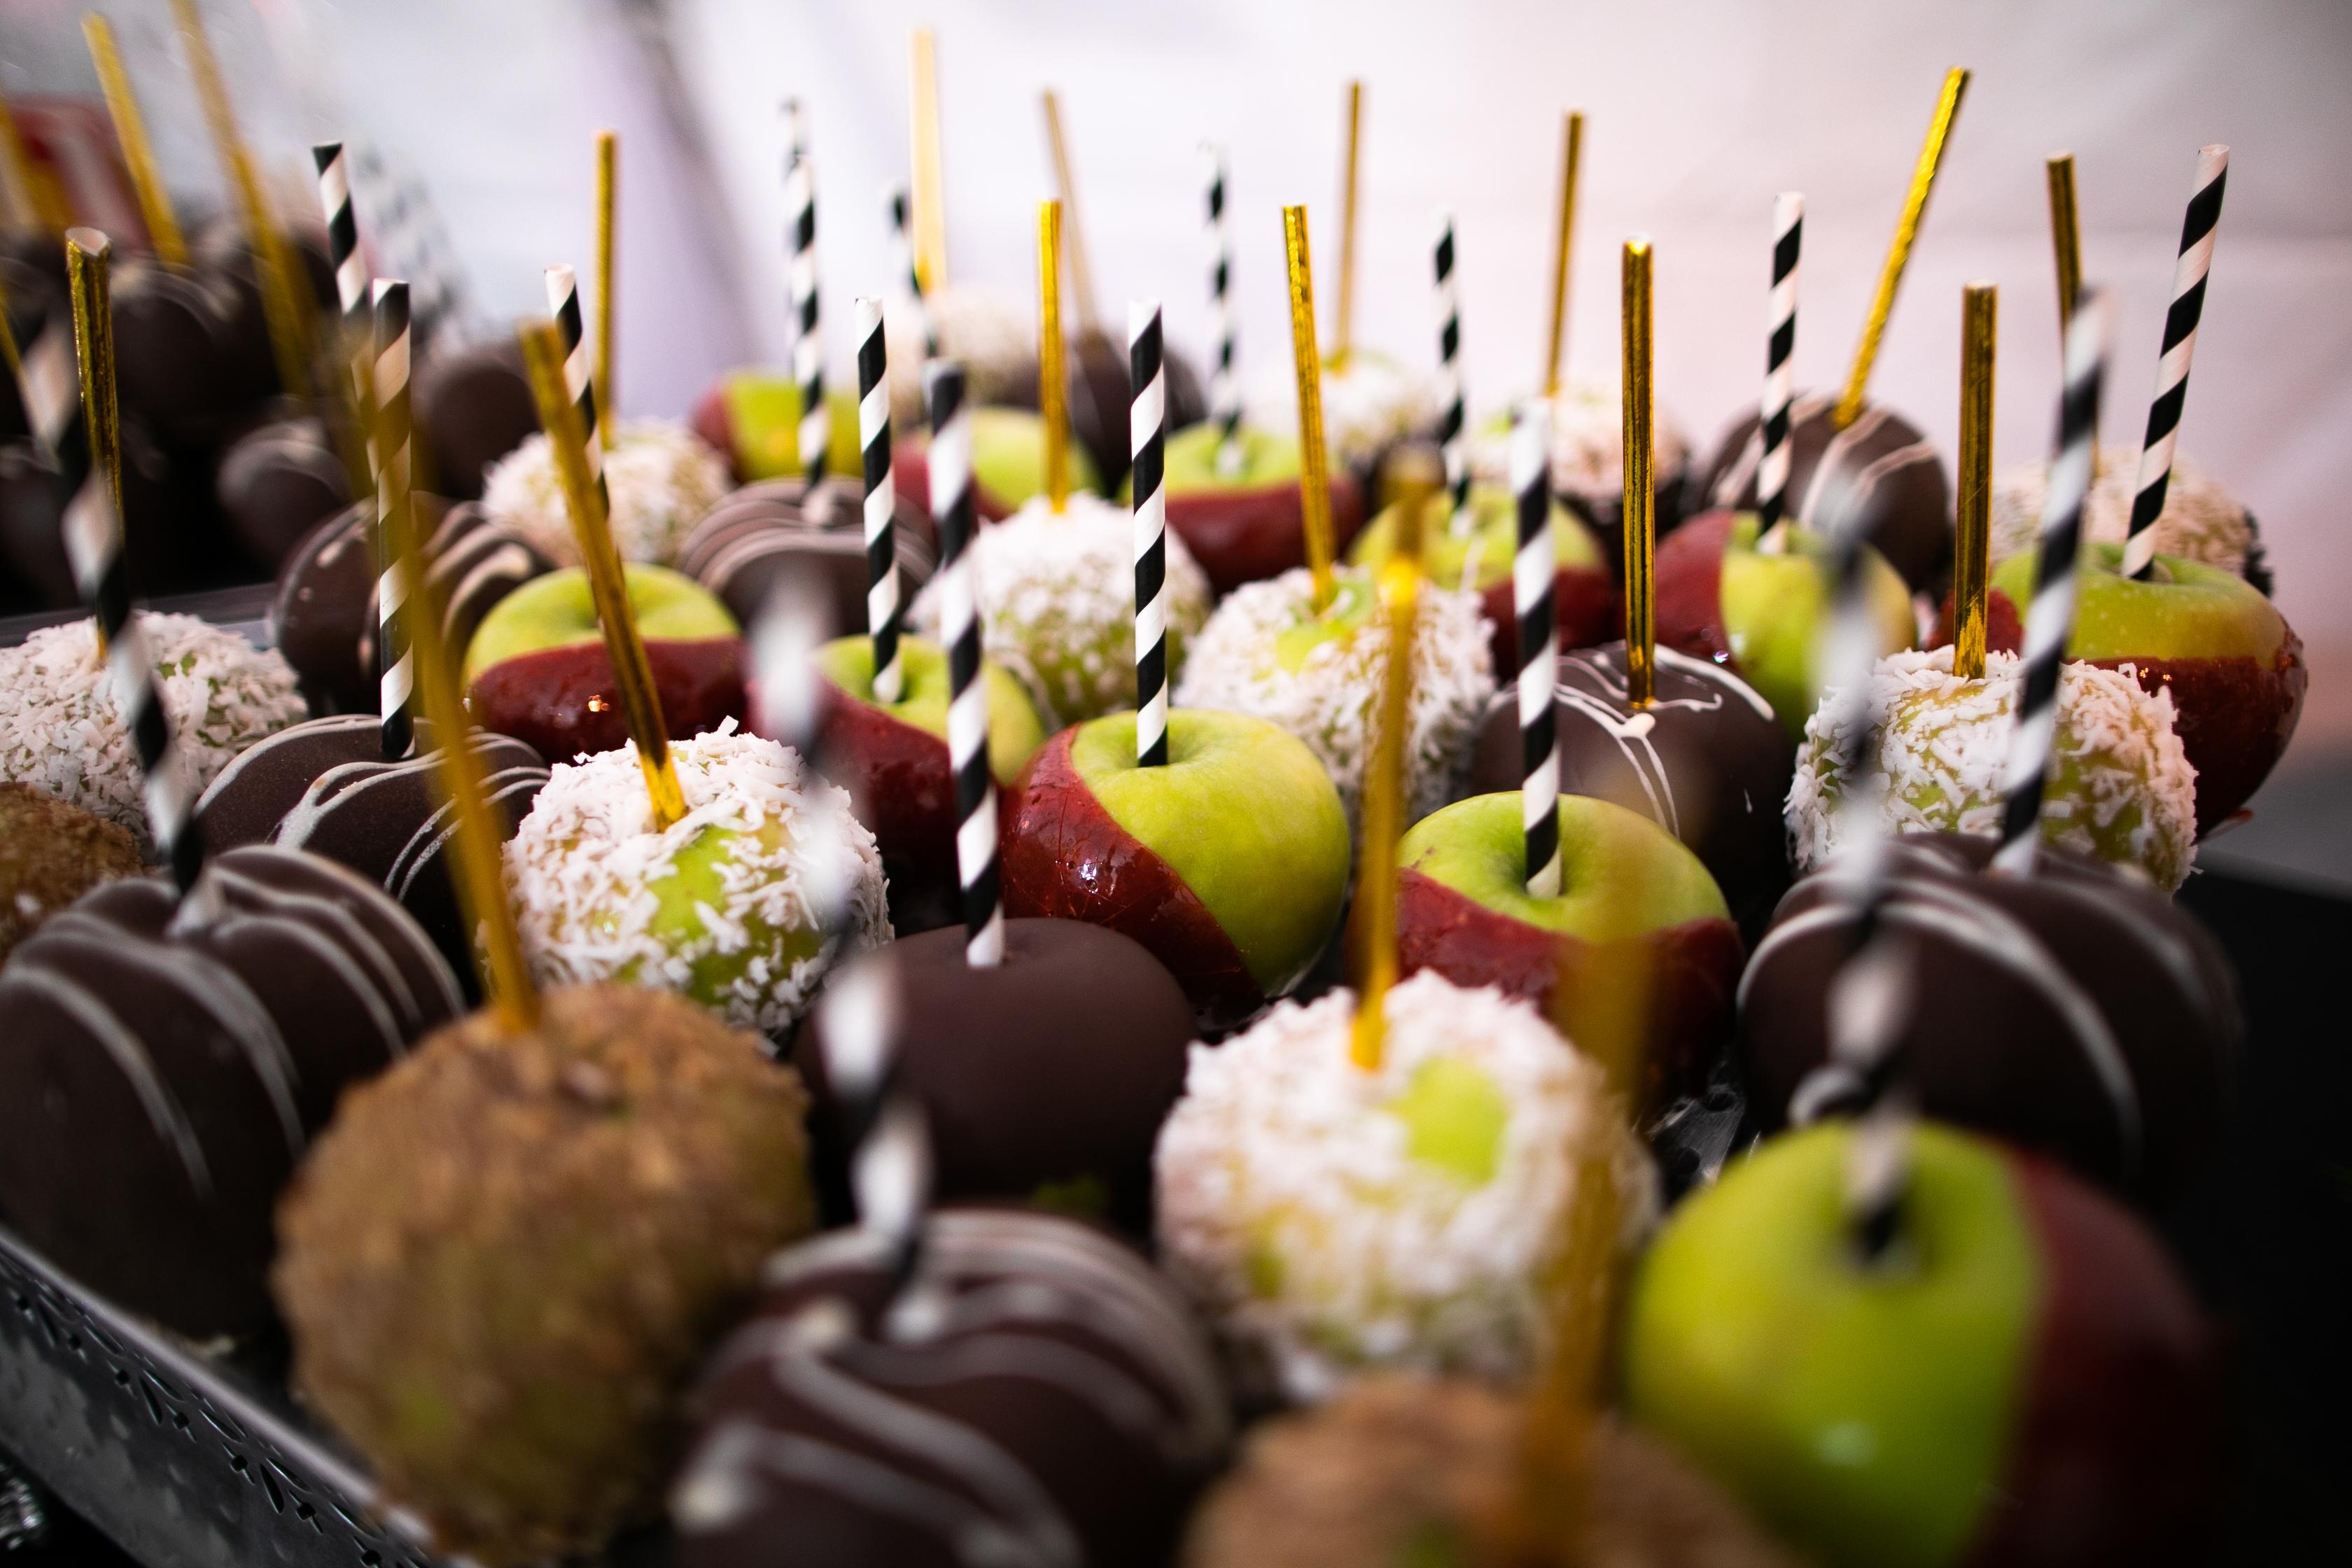 Assorted dessert apples